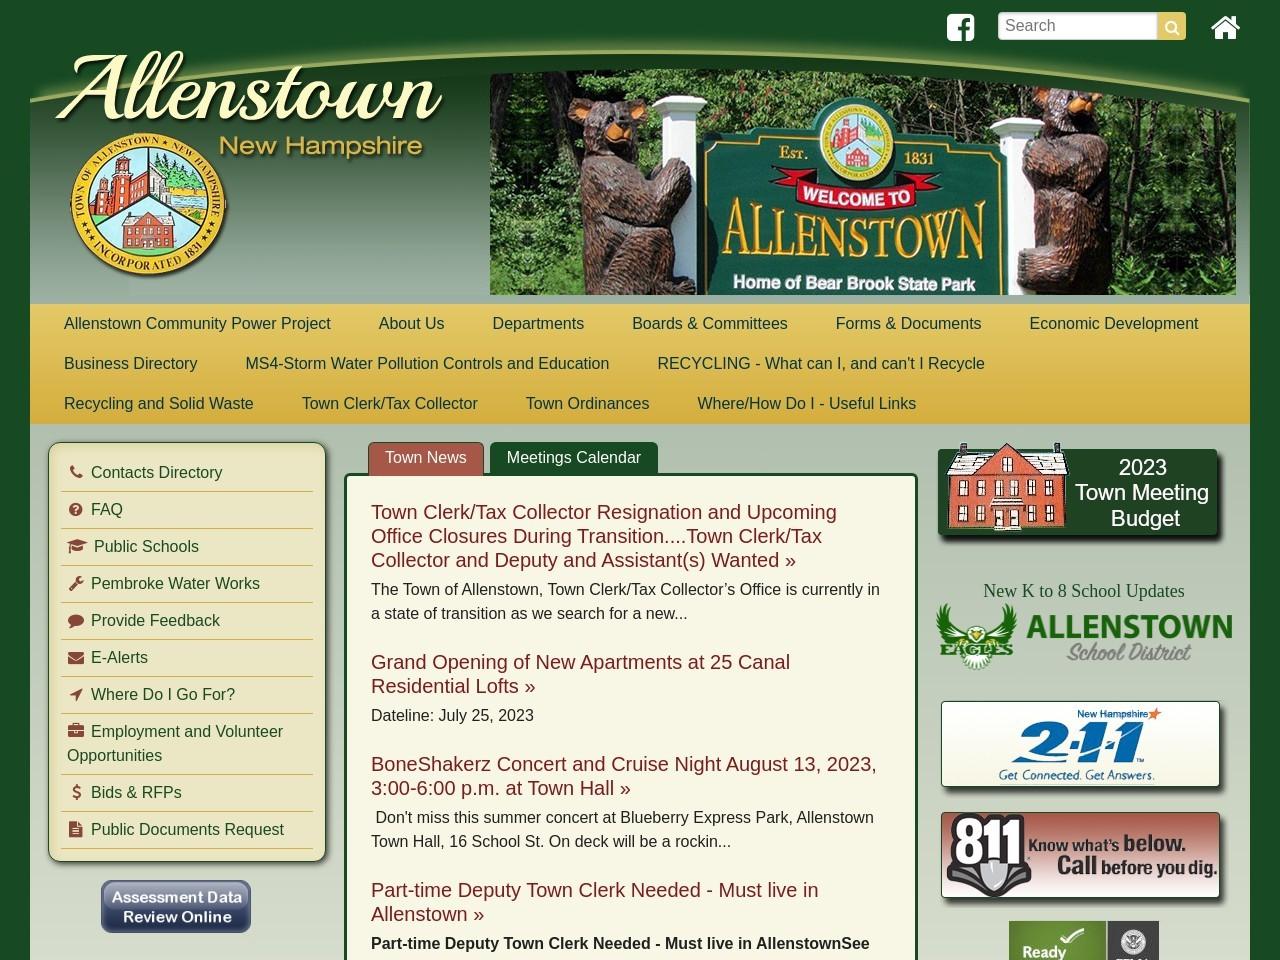 allenstownnh.gov